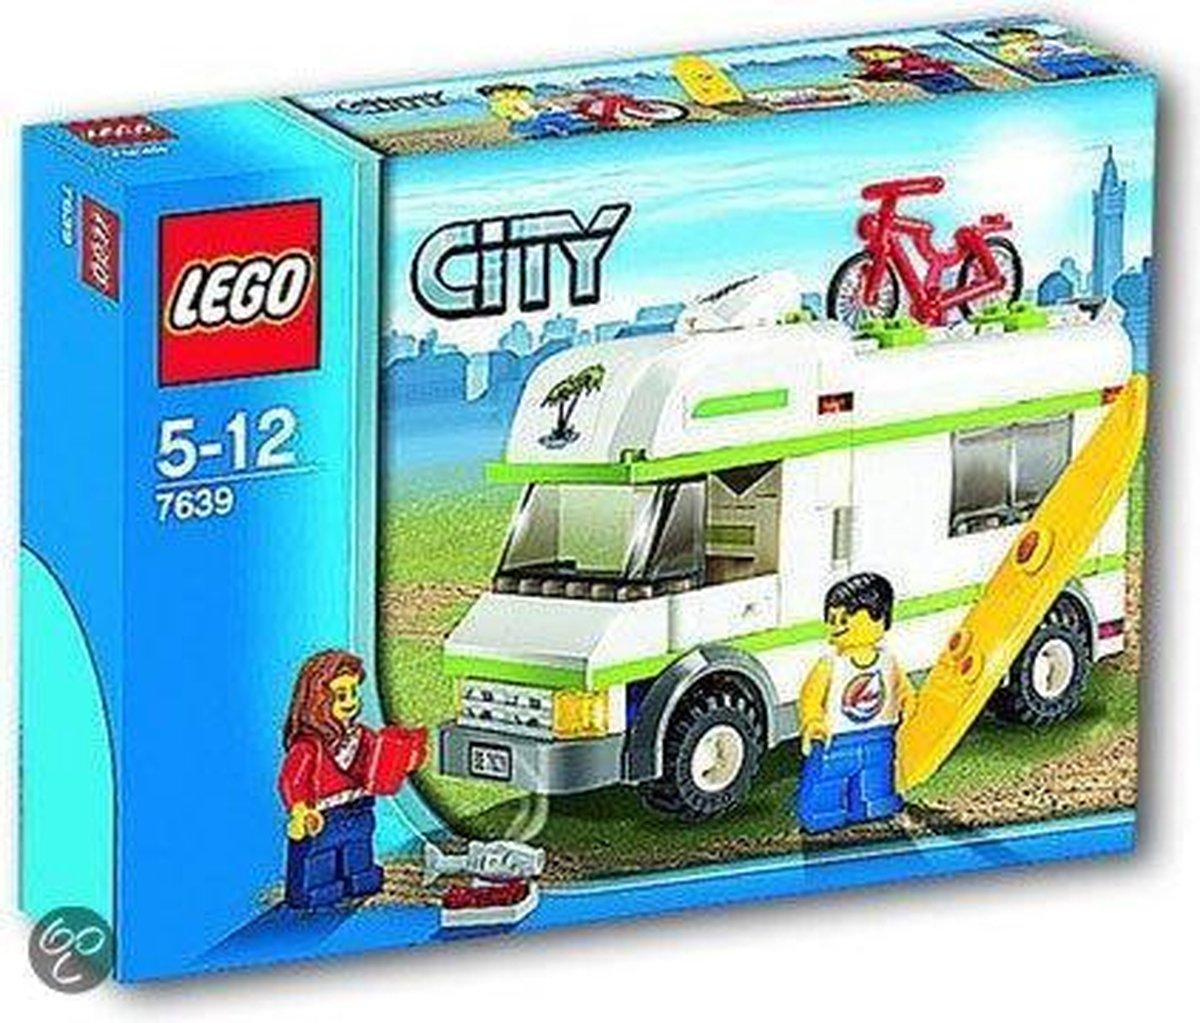 LEGO City Camper - 7639